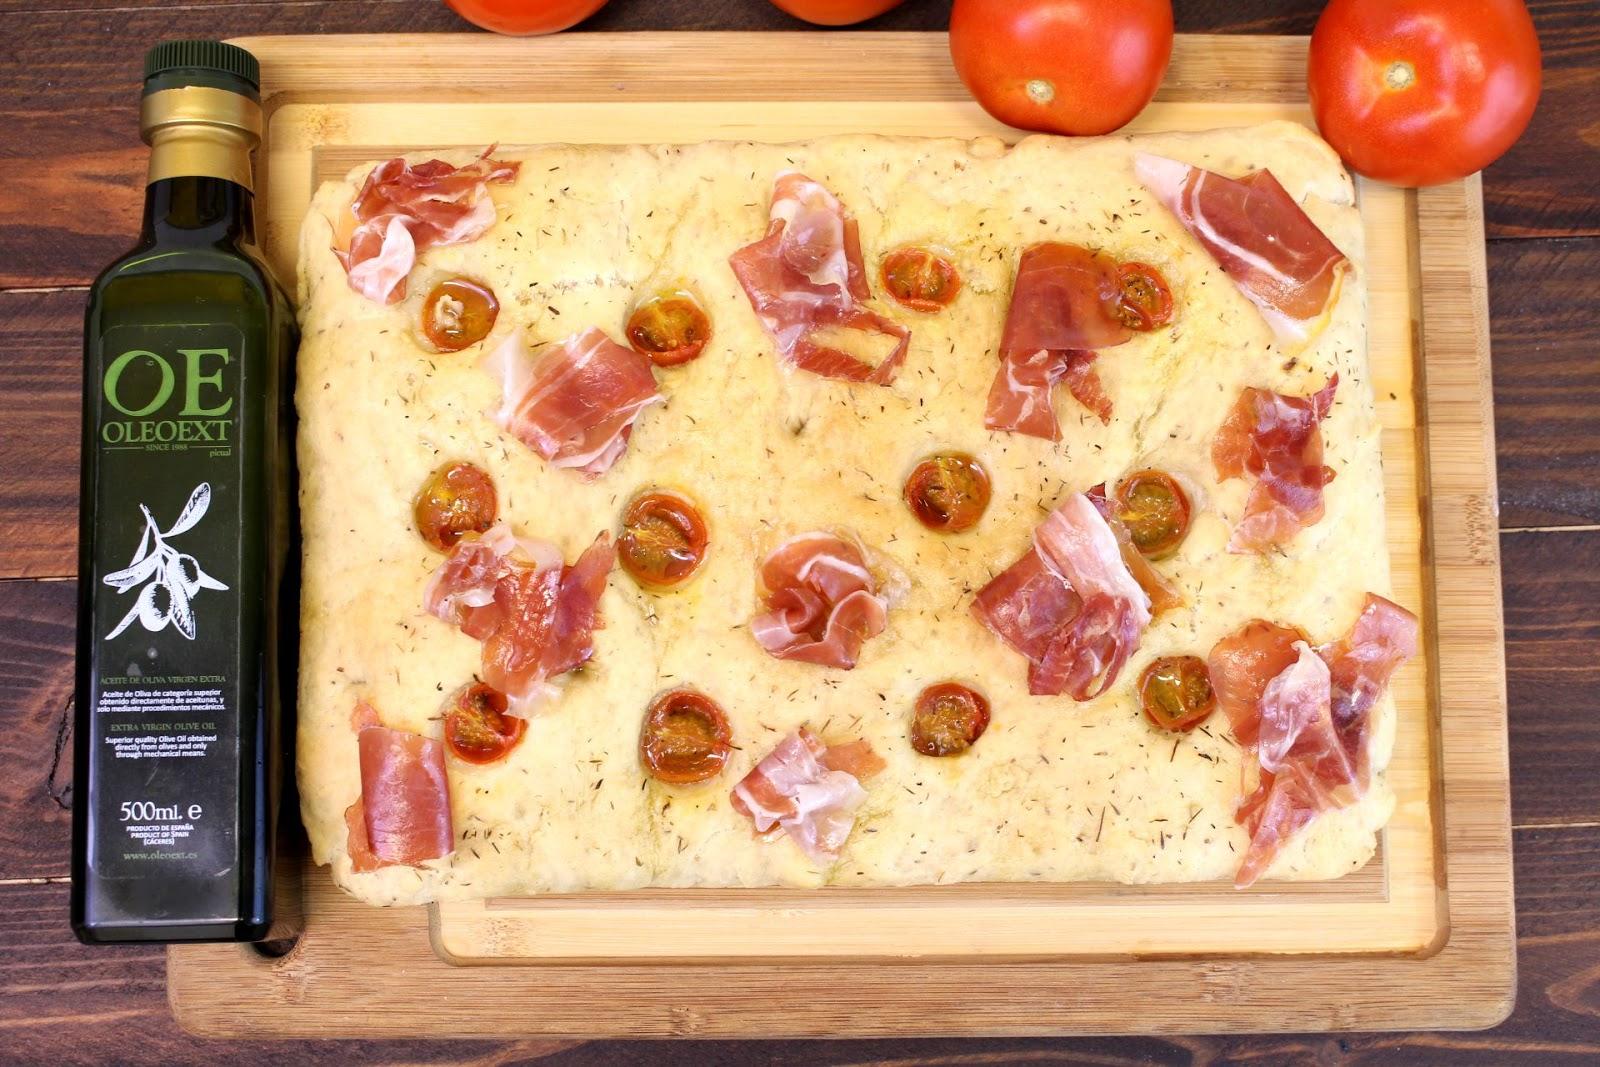 Receta de focaccia de jamón serrano con tomates cherry y tomillo